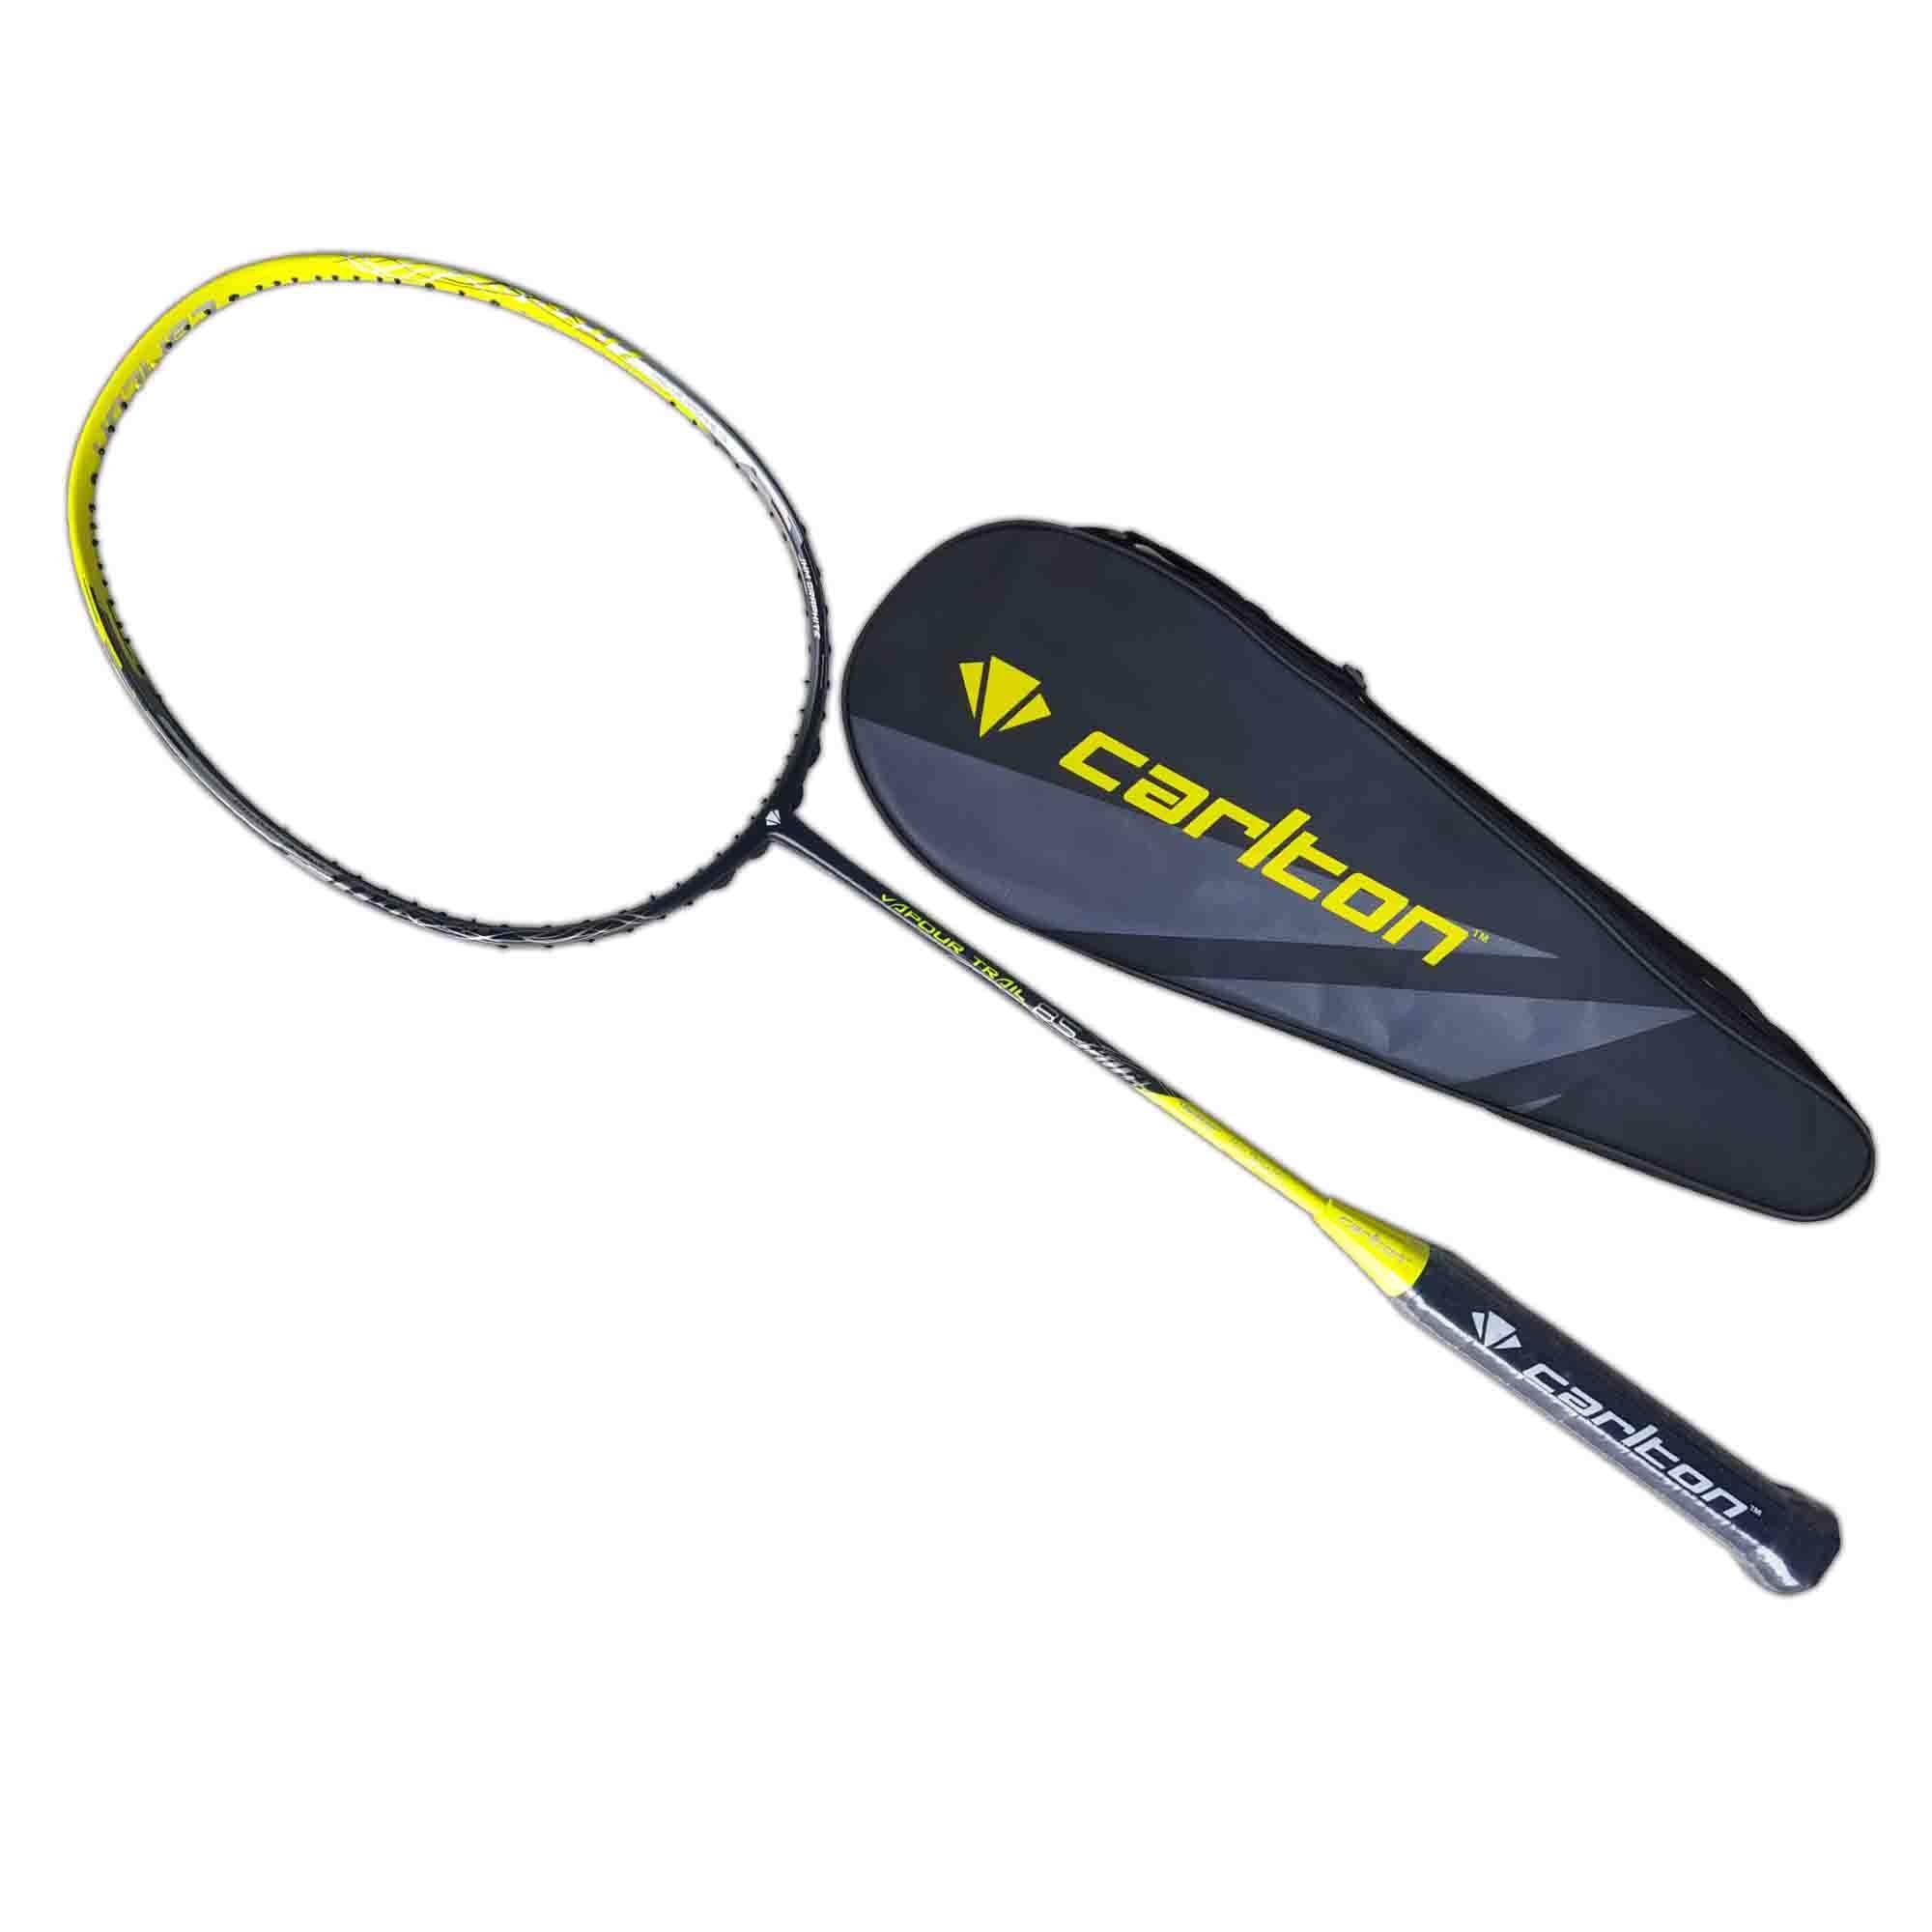 Carlton Badminton Racket Vapour Trail 85 (3U)